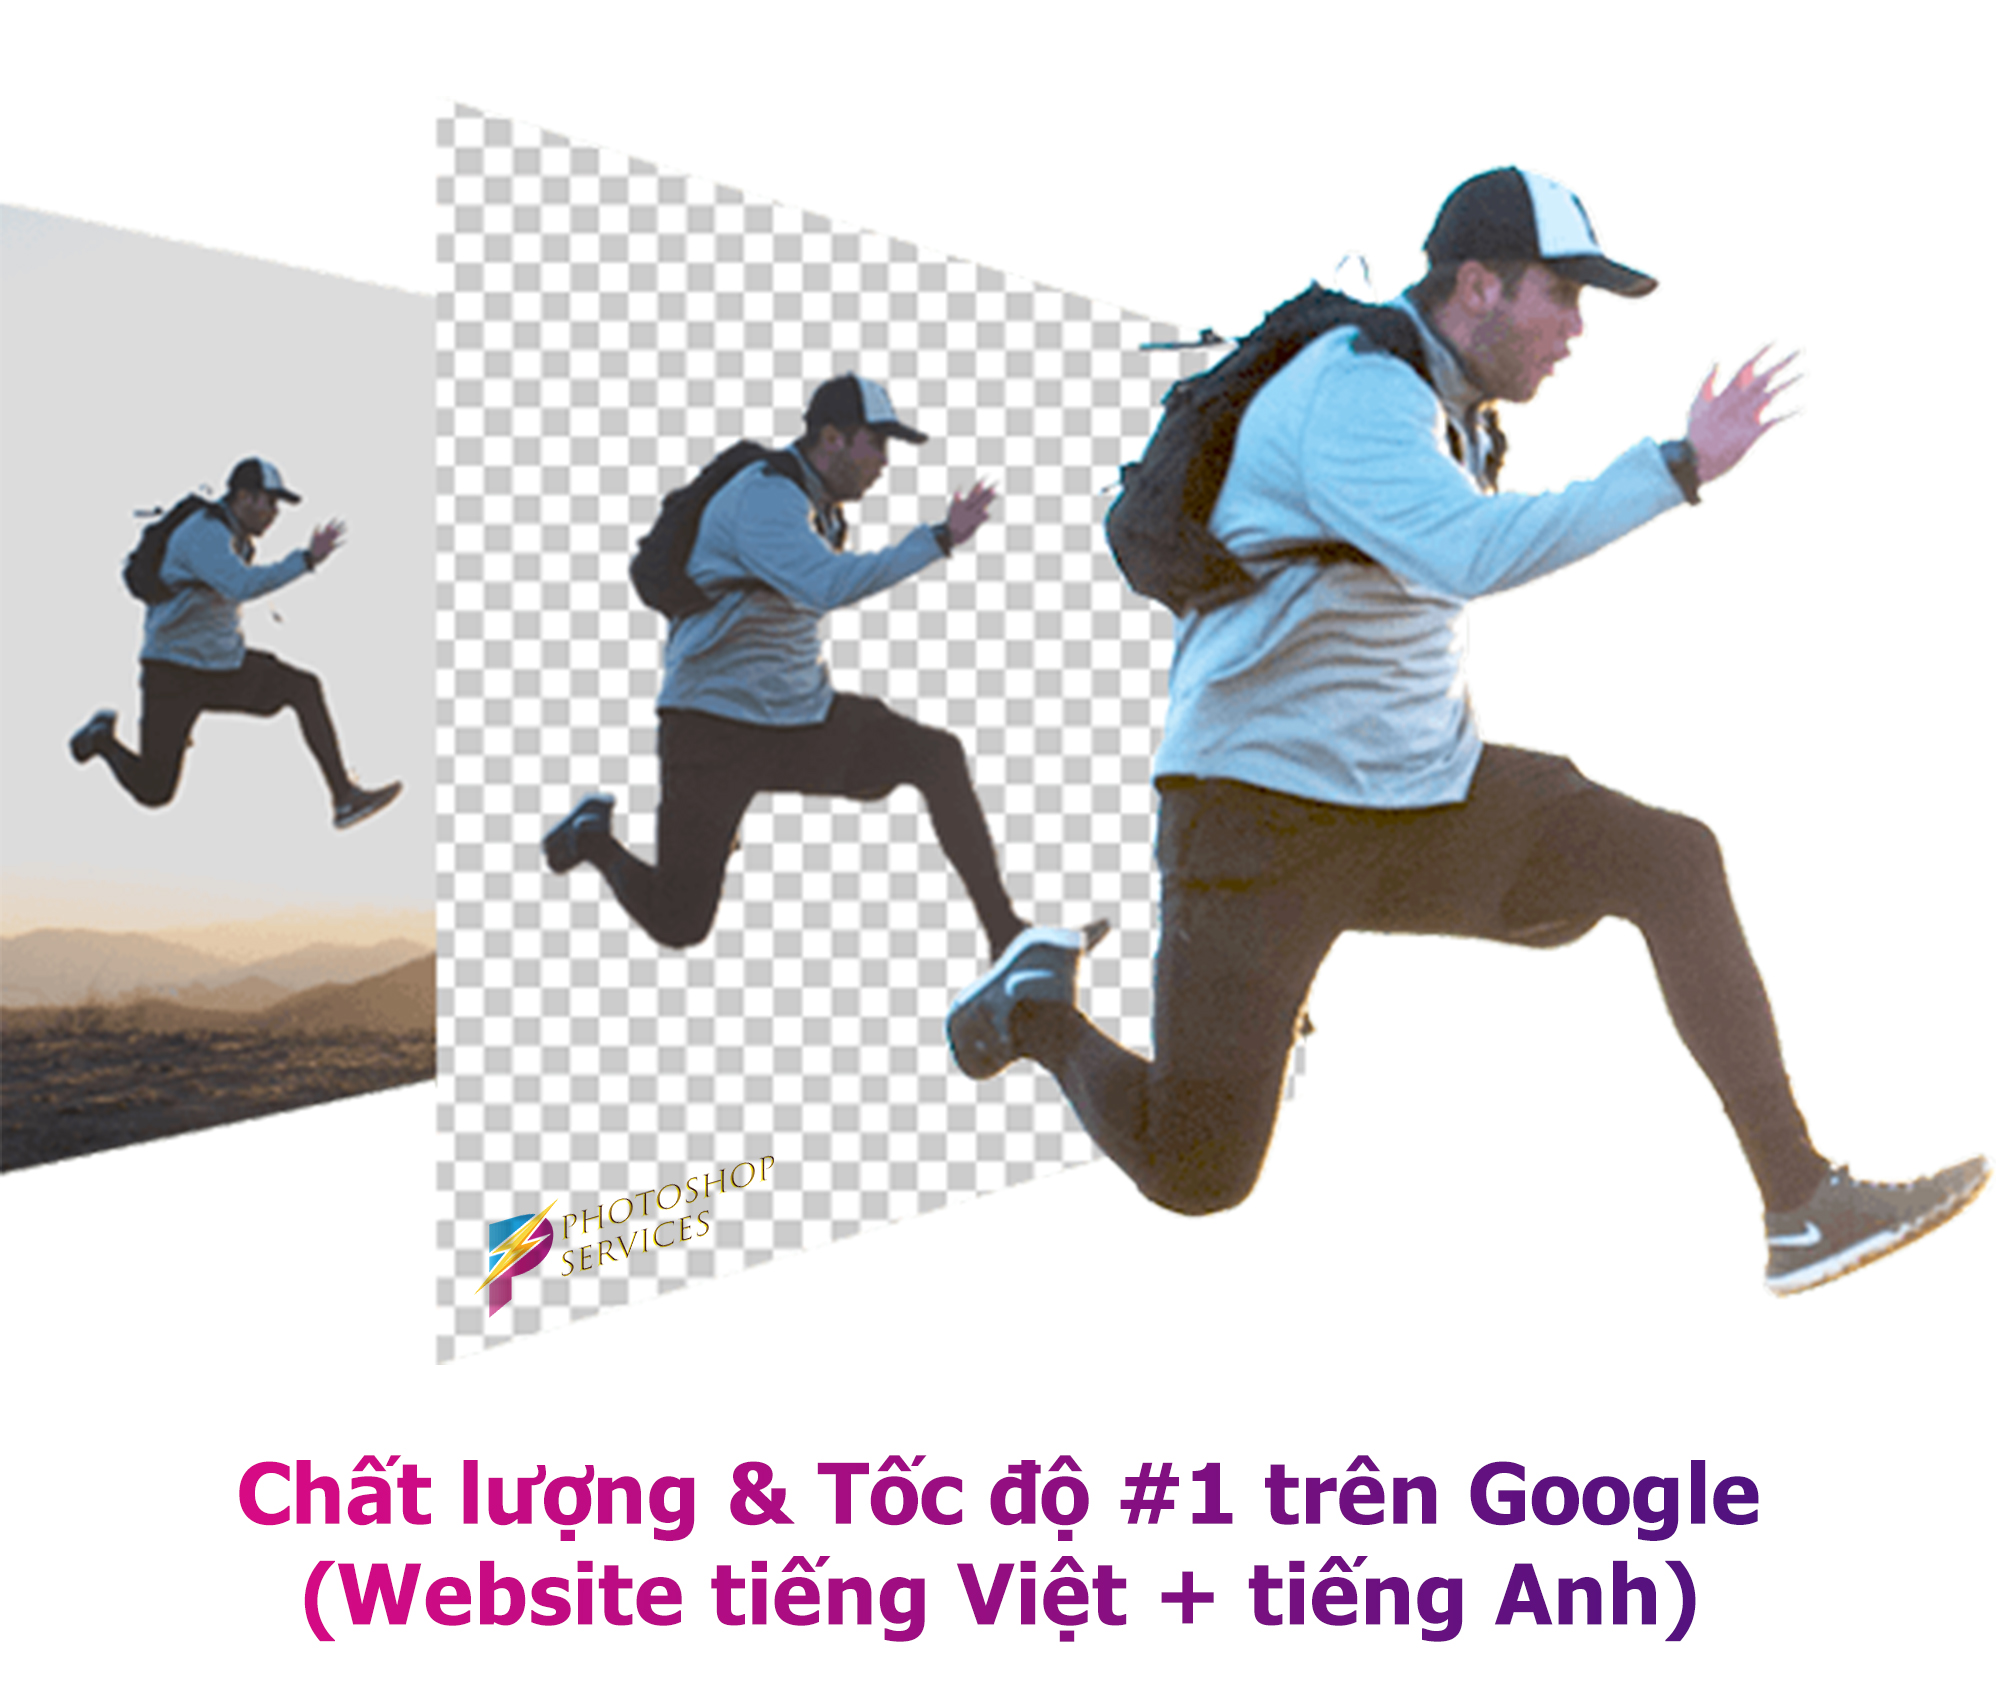 Tach Nen Online 1 Google Dịch Vụ Chỉnh Sửa Ảnh Photoshop